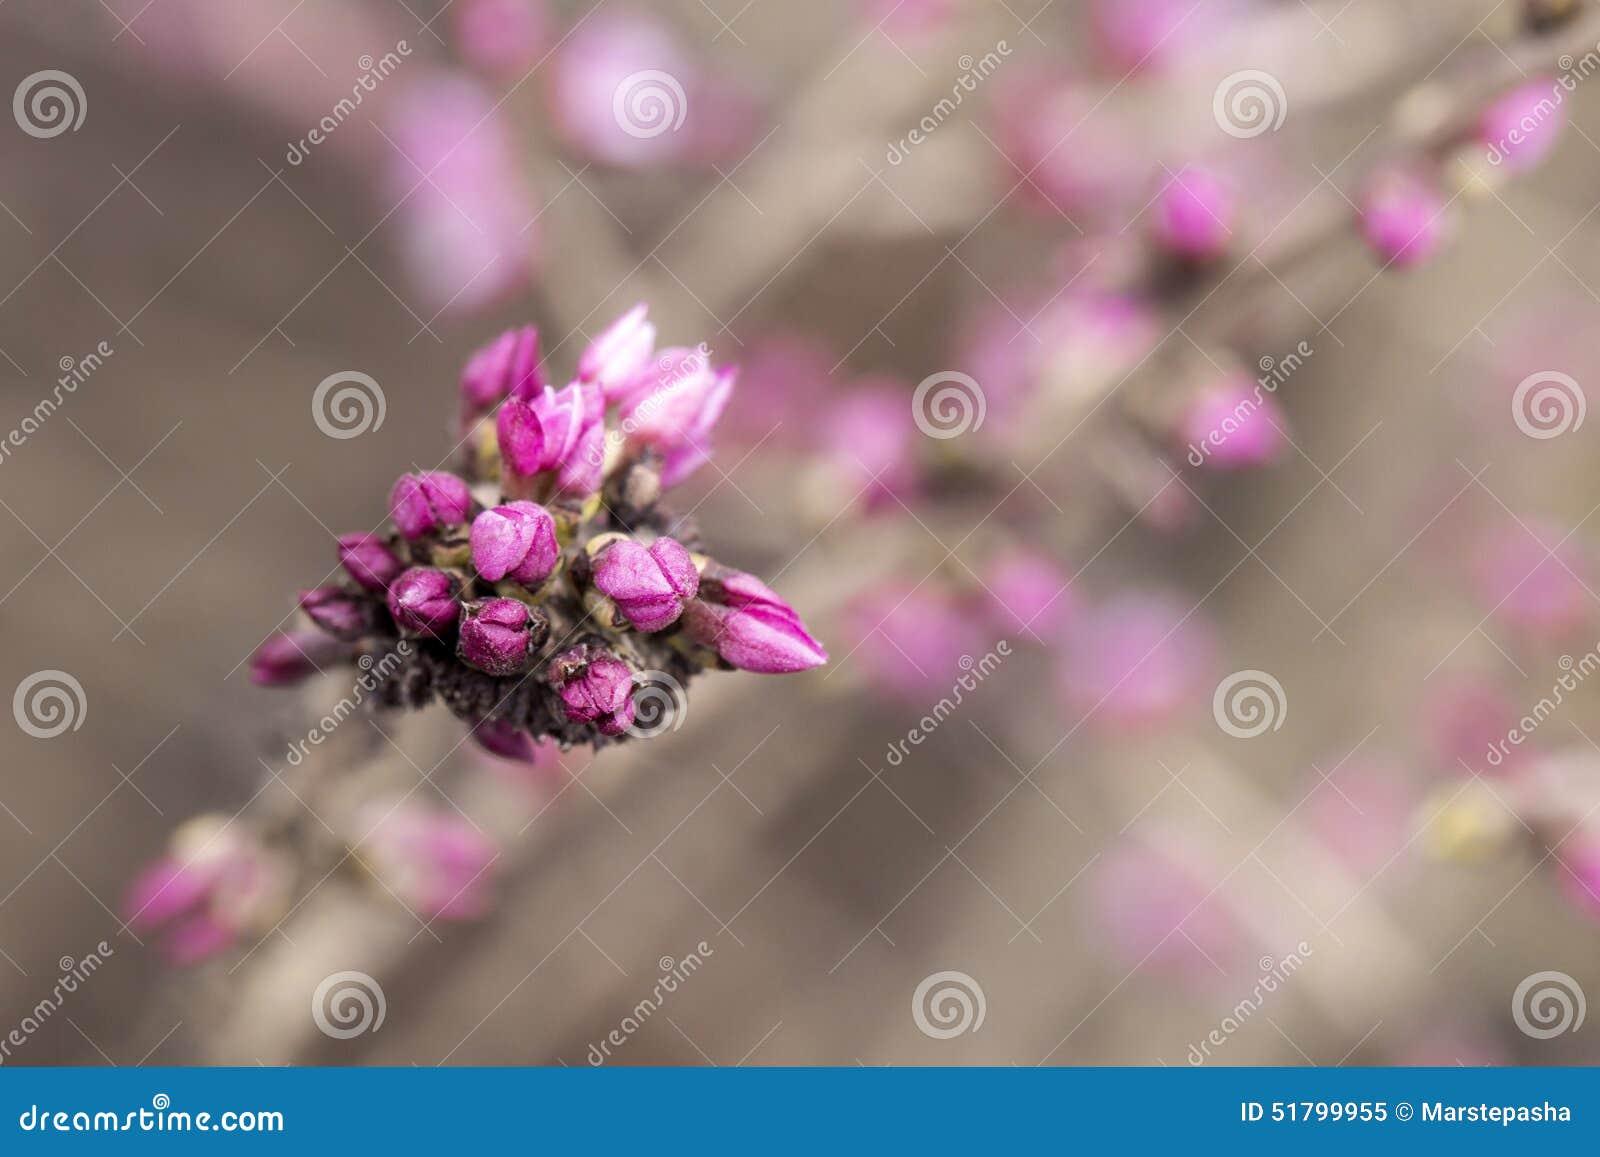 Daphne Buds Close Up Stock Image Image Of Spring Mezreum 51799955